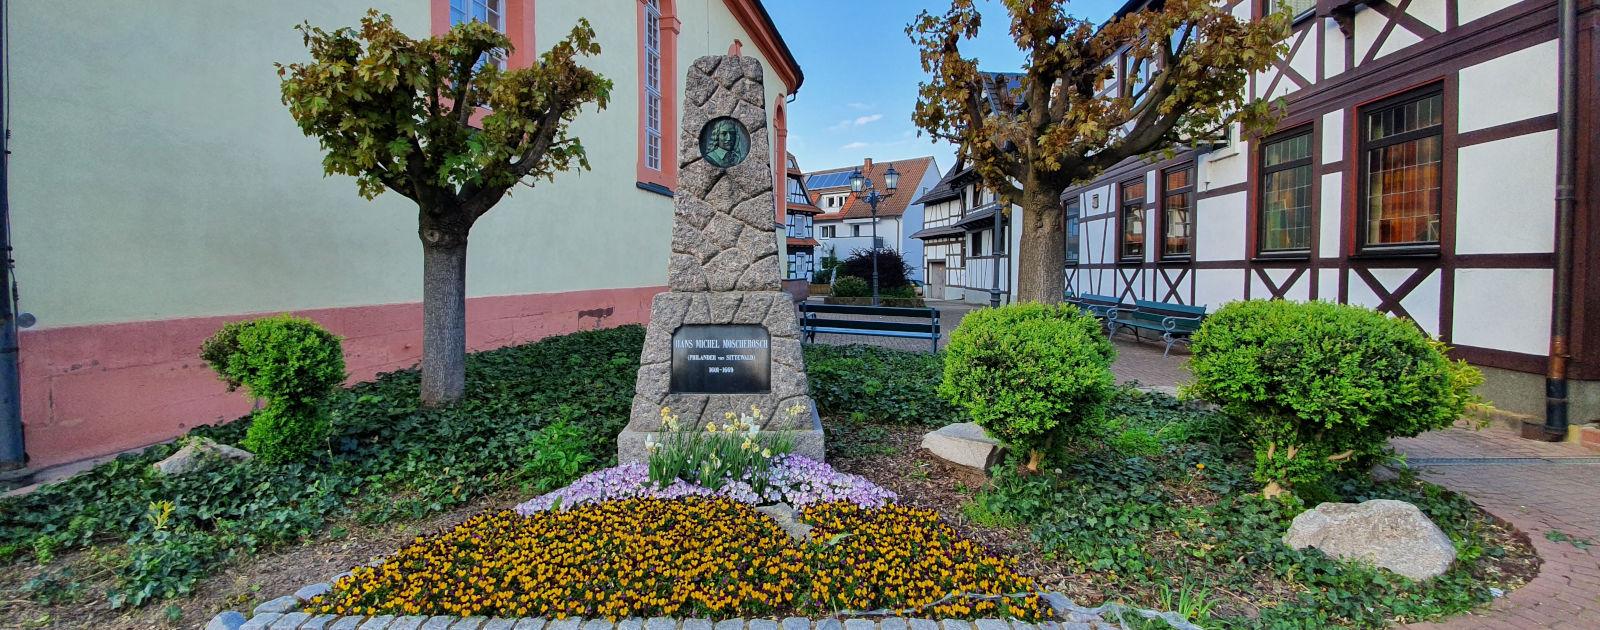 Moscherosch Denkmal in Willstätt